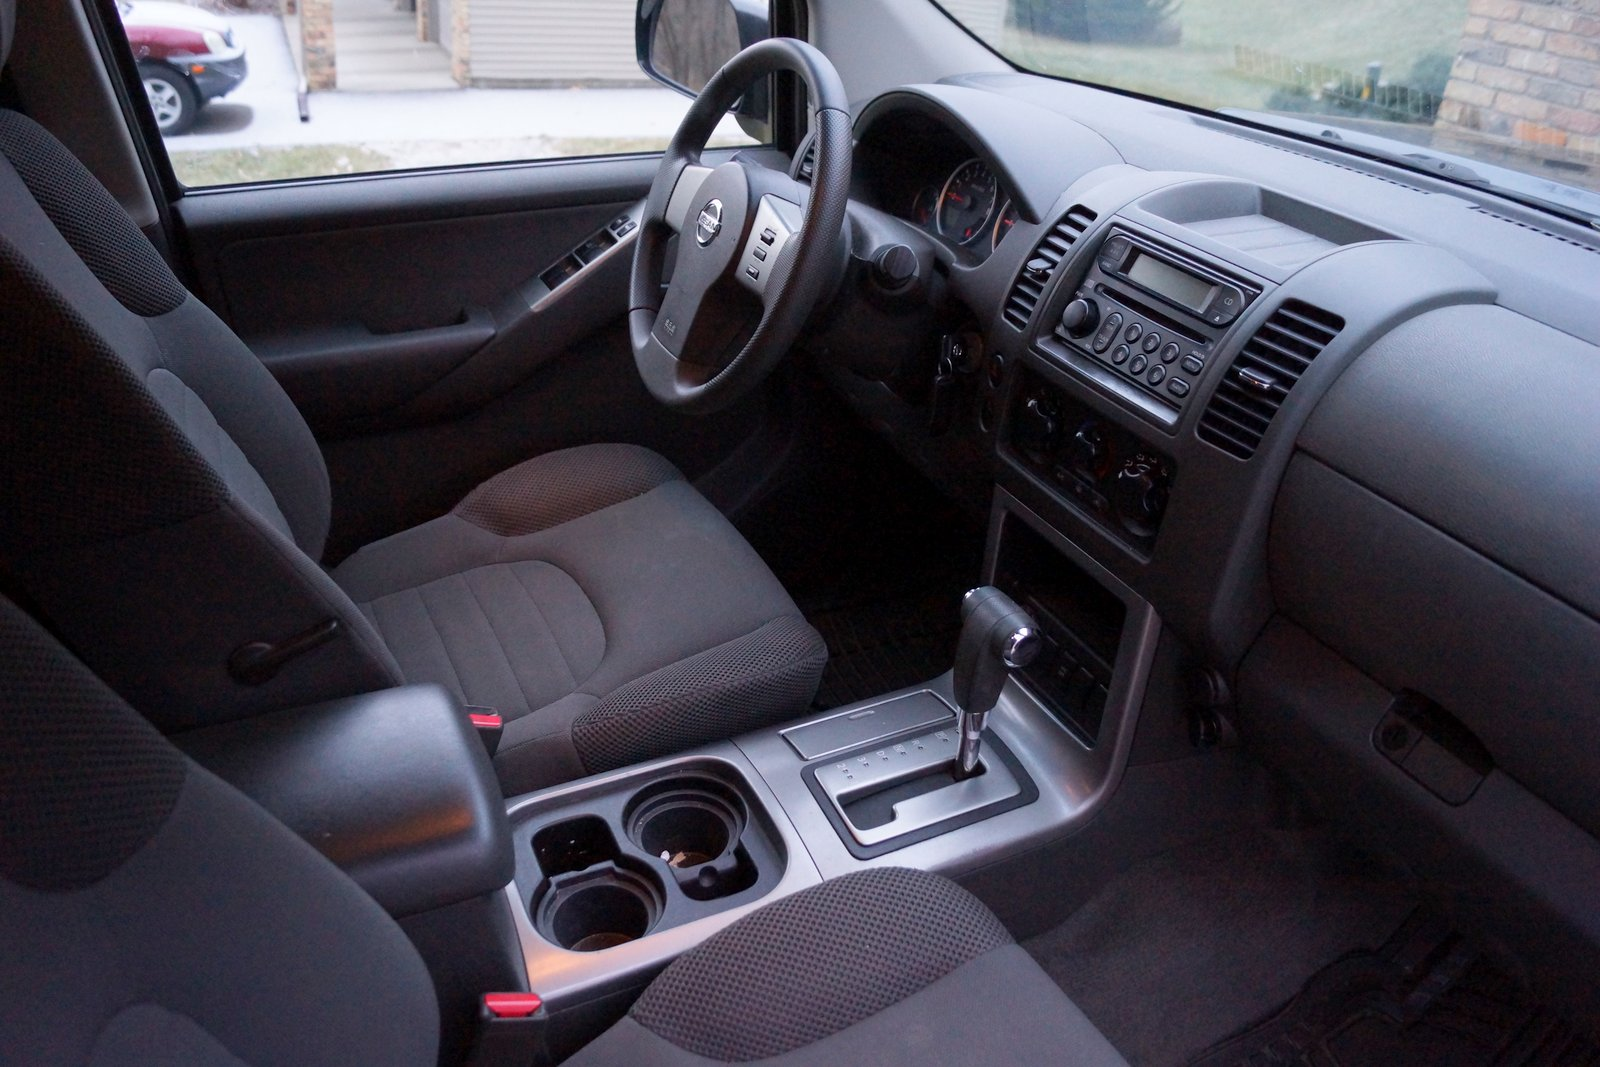 2006 Nissan Pathfinder - Pictures - CarGurus